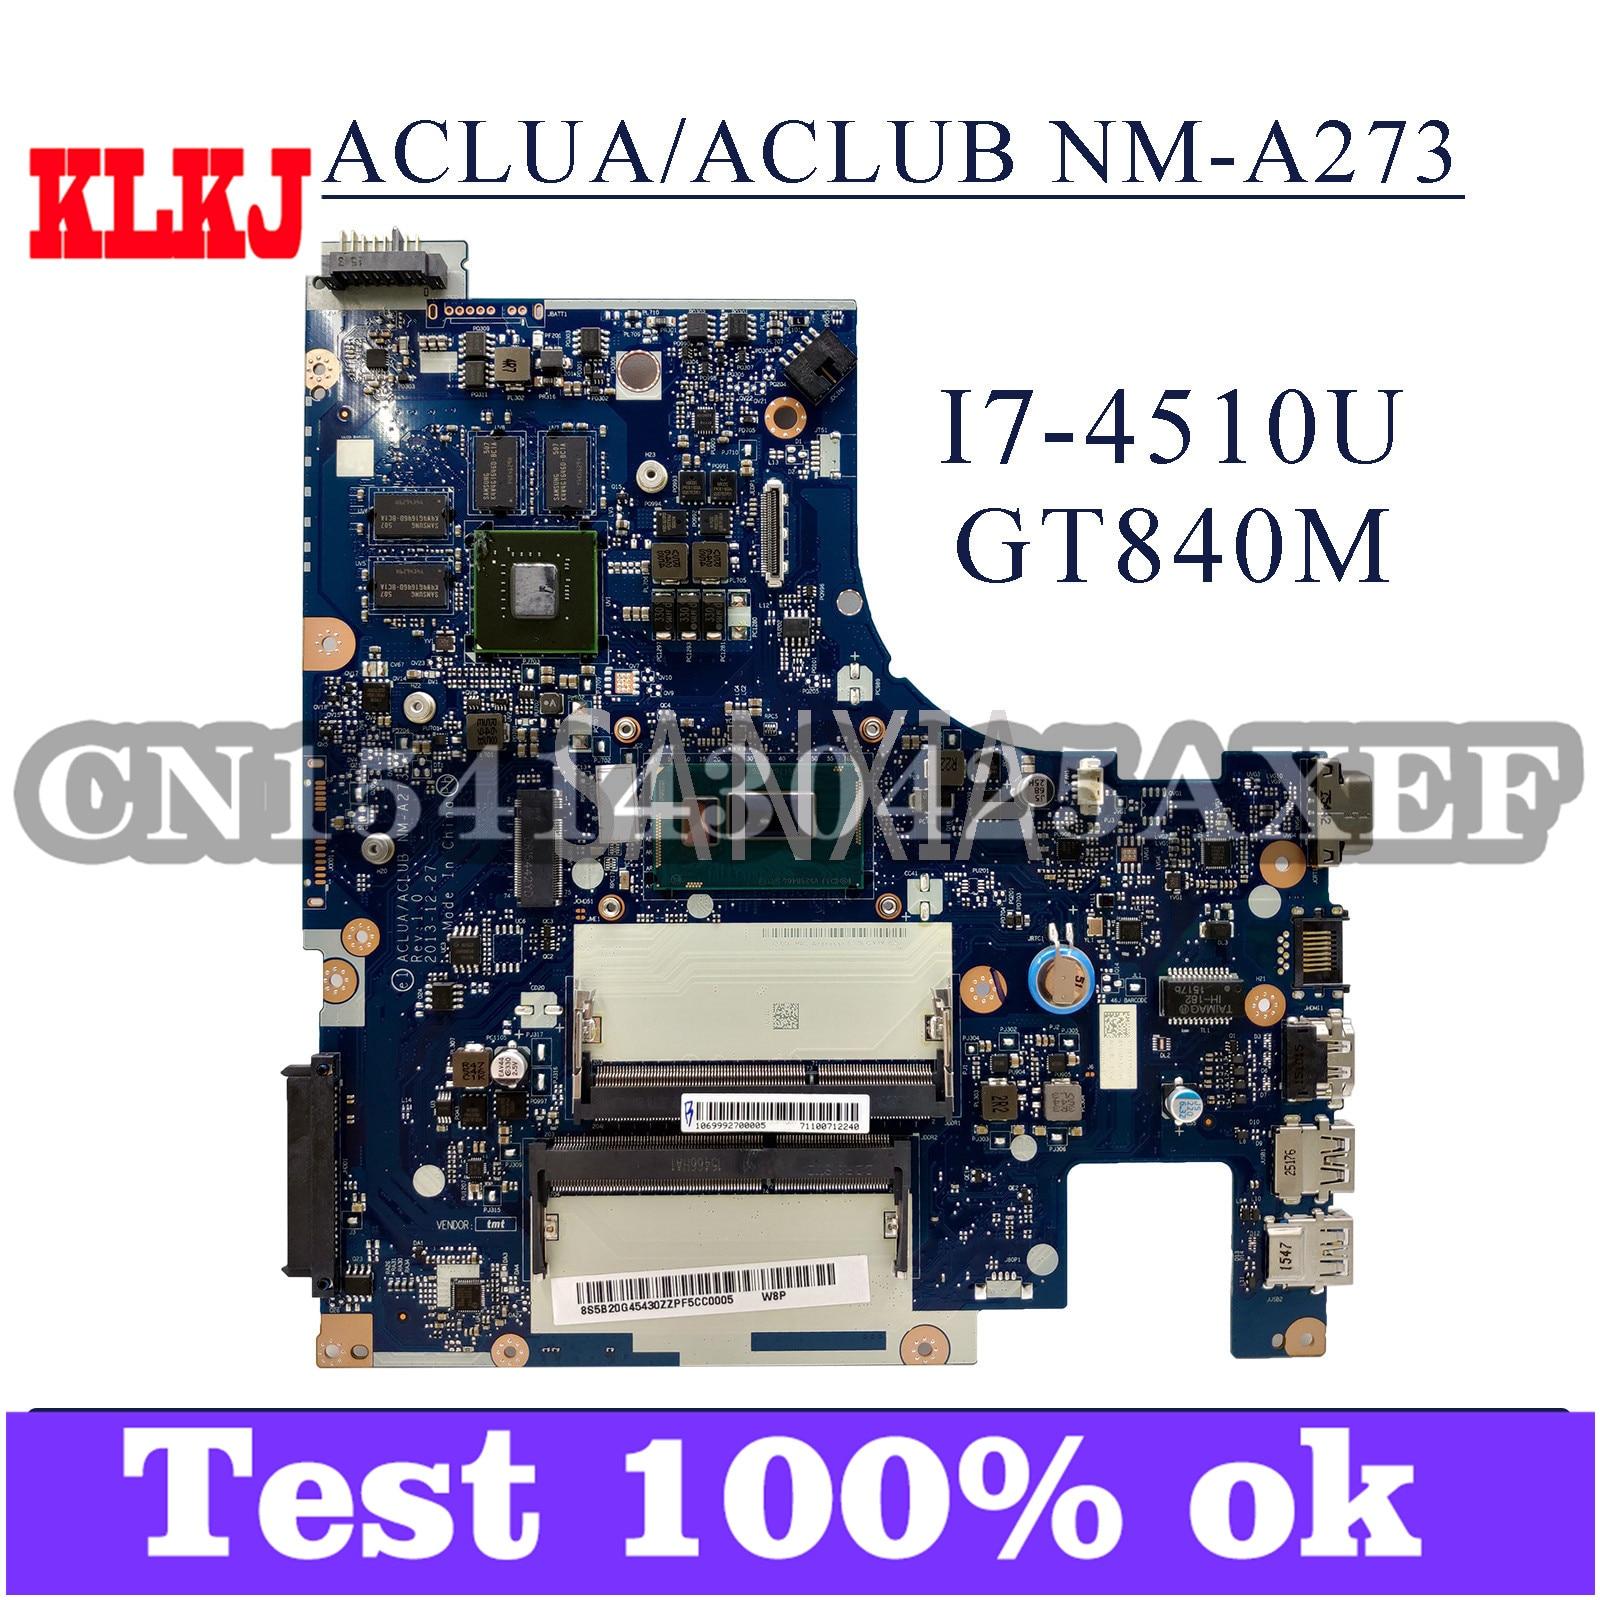 KLKJ NM-A273 اللوحة المحمول لينوفو Z50-70 G50-70M اللوحة الأصلية I7-4510U GT840M